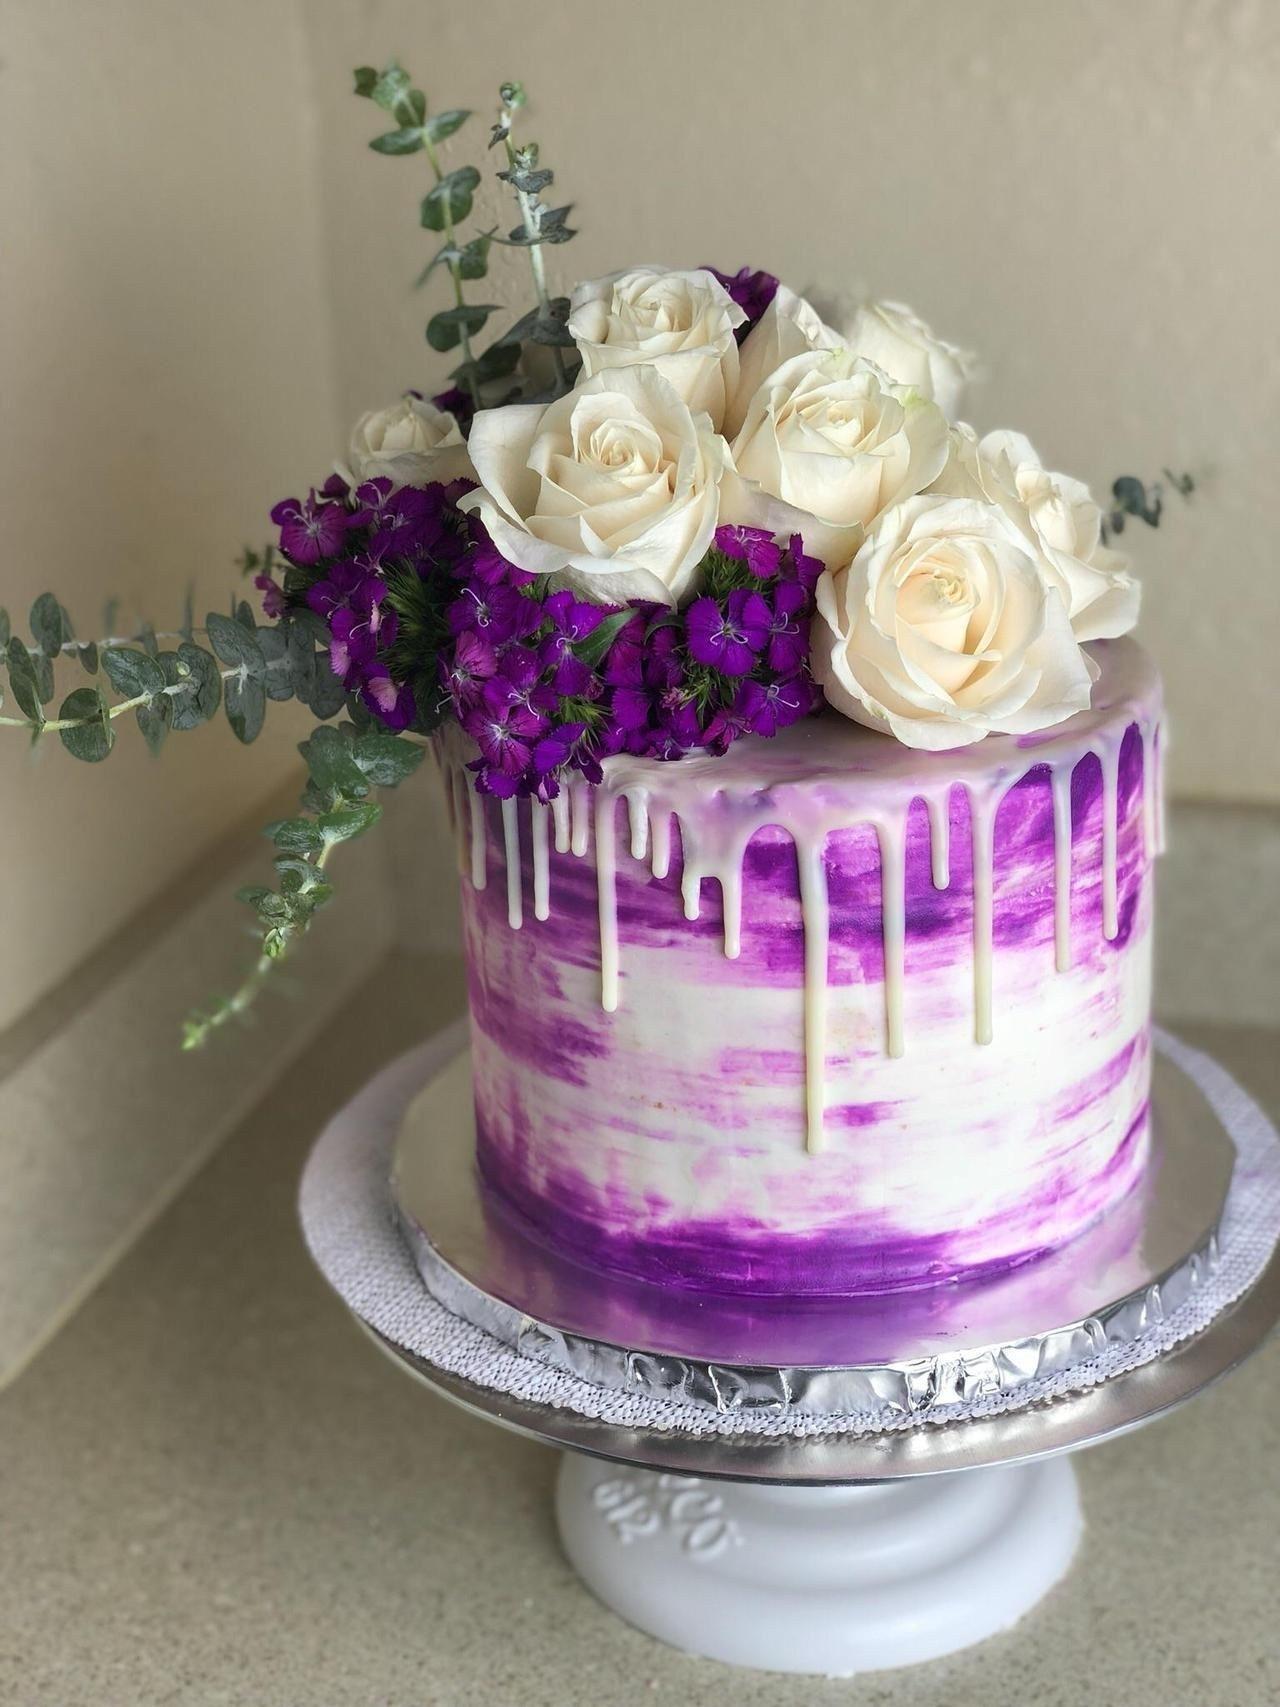 Birthday Cakes For 14 Years Old Girl Swankydessertsbirthday Cake